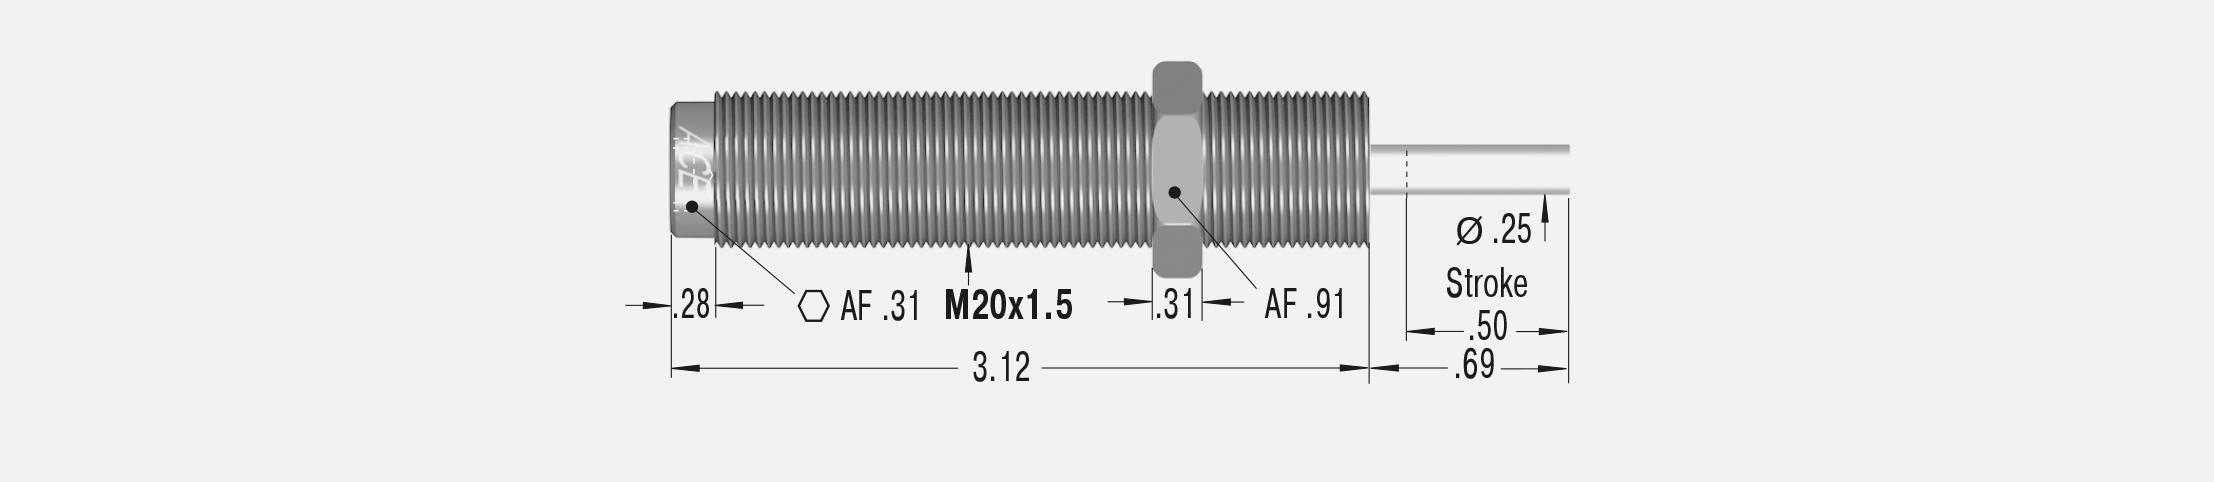 MC225MH-V4A